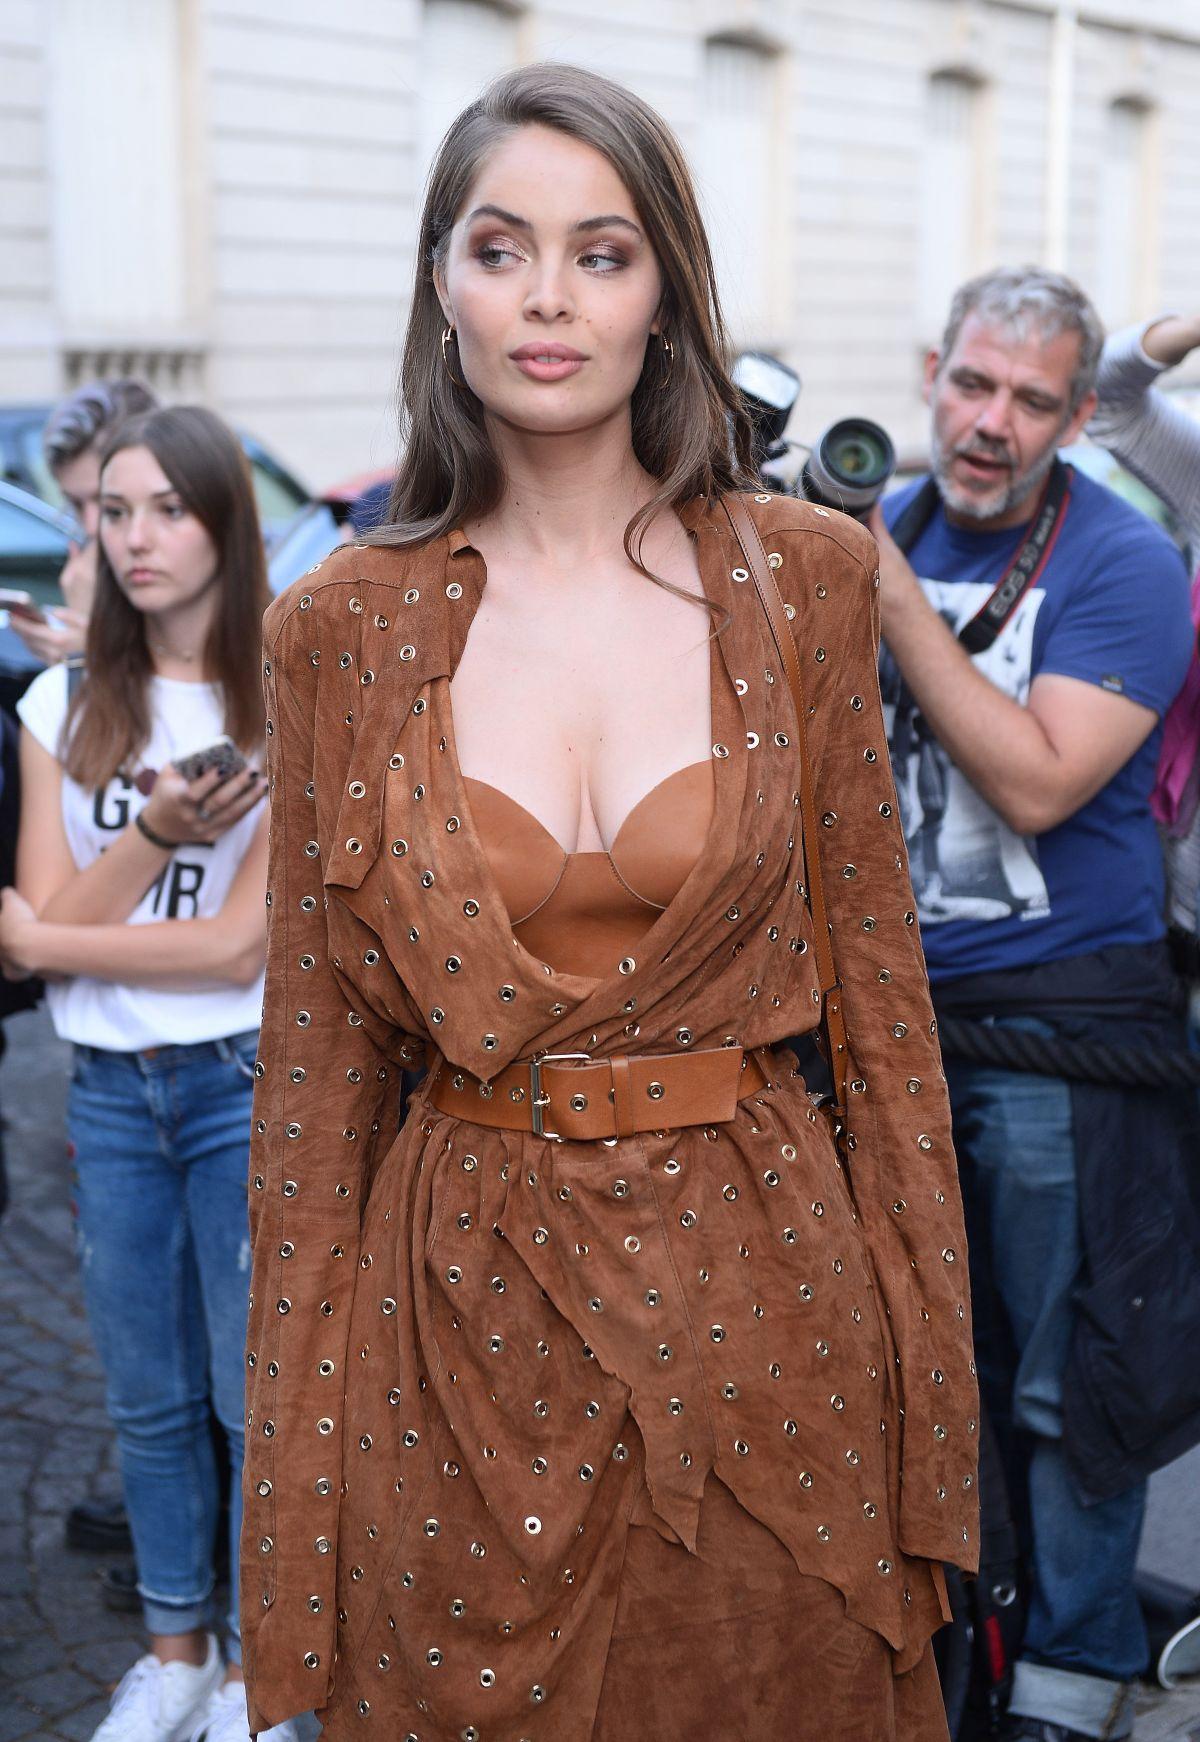 MARIE-ANGE CASTA at Vogue Party at Paris Fashion Week 07/04/2017